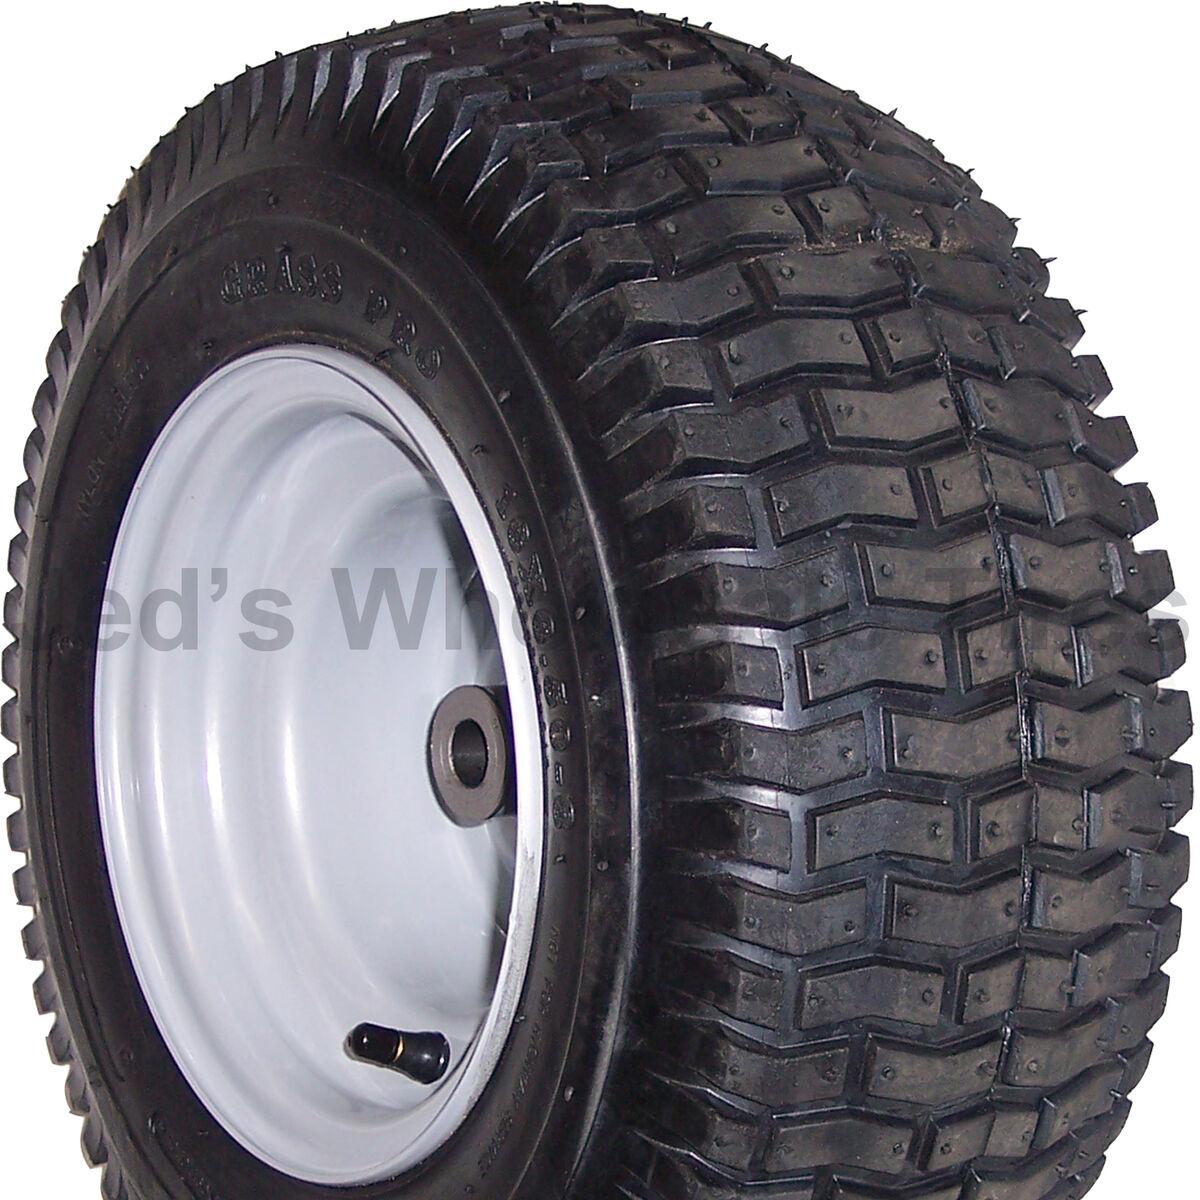 1 16x6 50 8 16 6 50 8 Riding Lawn Mower Garden Tractor Tire Rim Wheel Assembly